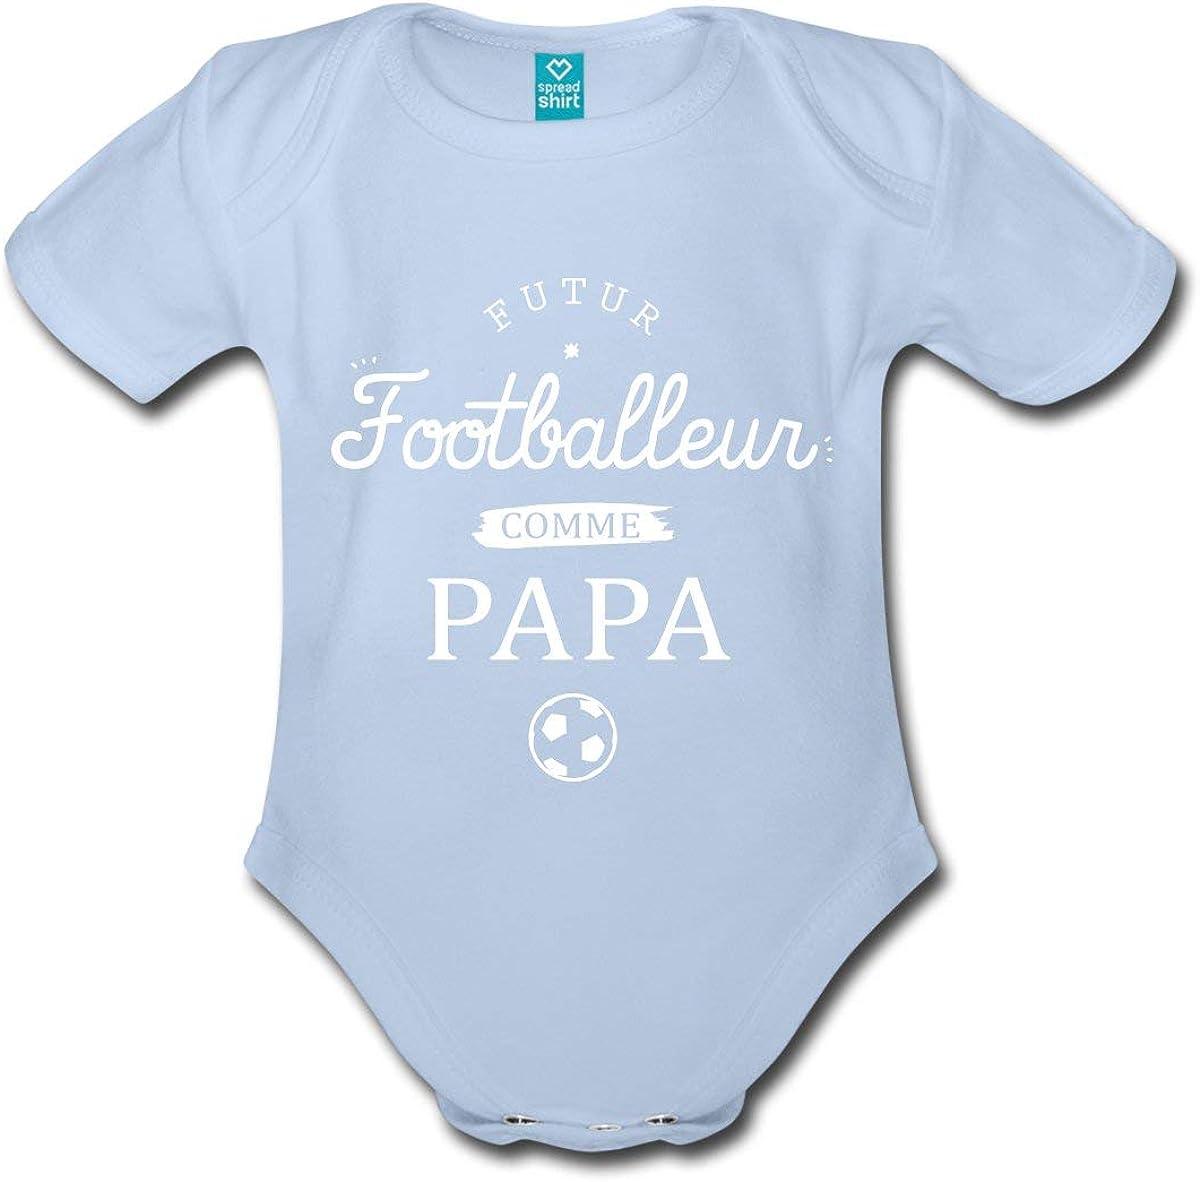 Spreadshirt Futur Footballeur comme Papa Body B/éb/é Bio Manches Courtes